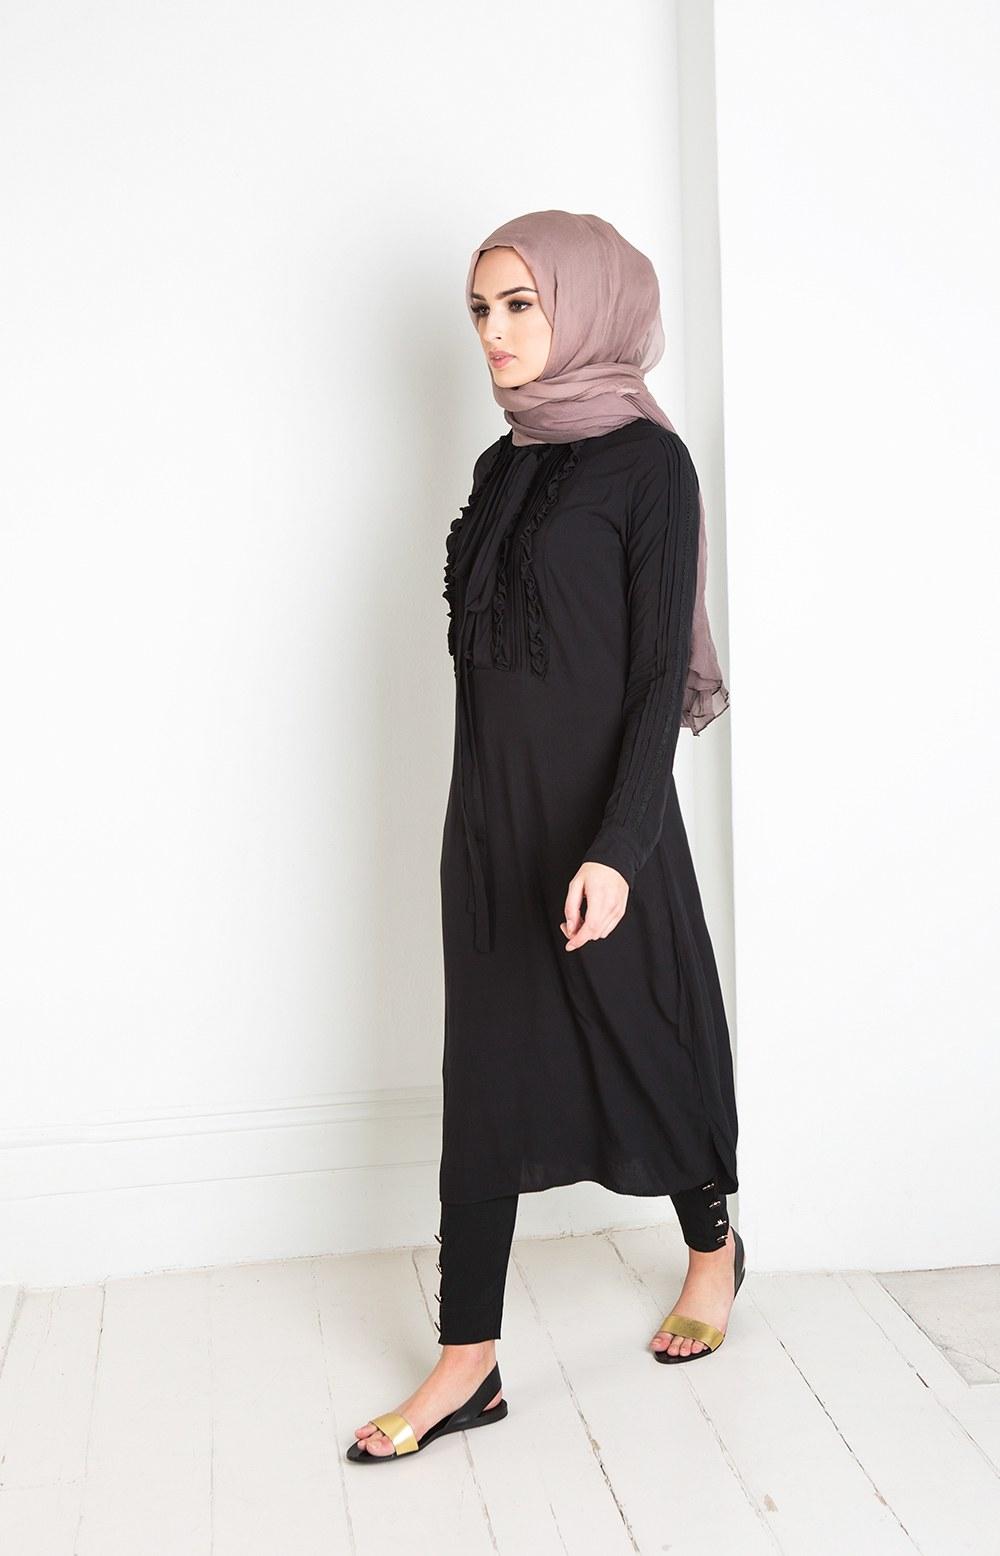 Model Model Baju Lebaran Tahun 2017 U3dh 25 Trend Model Baju Muslim Lebaran 2018 Simple & Modis